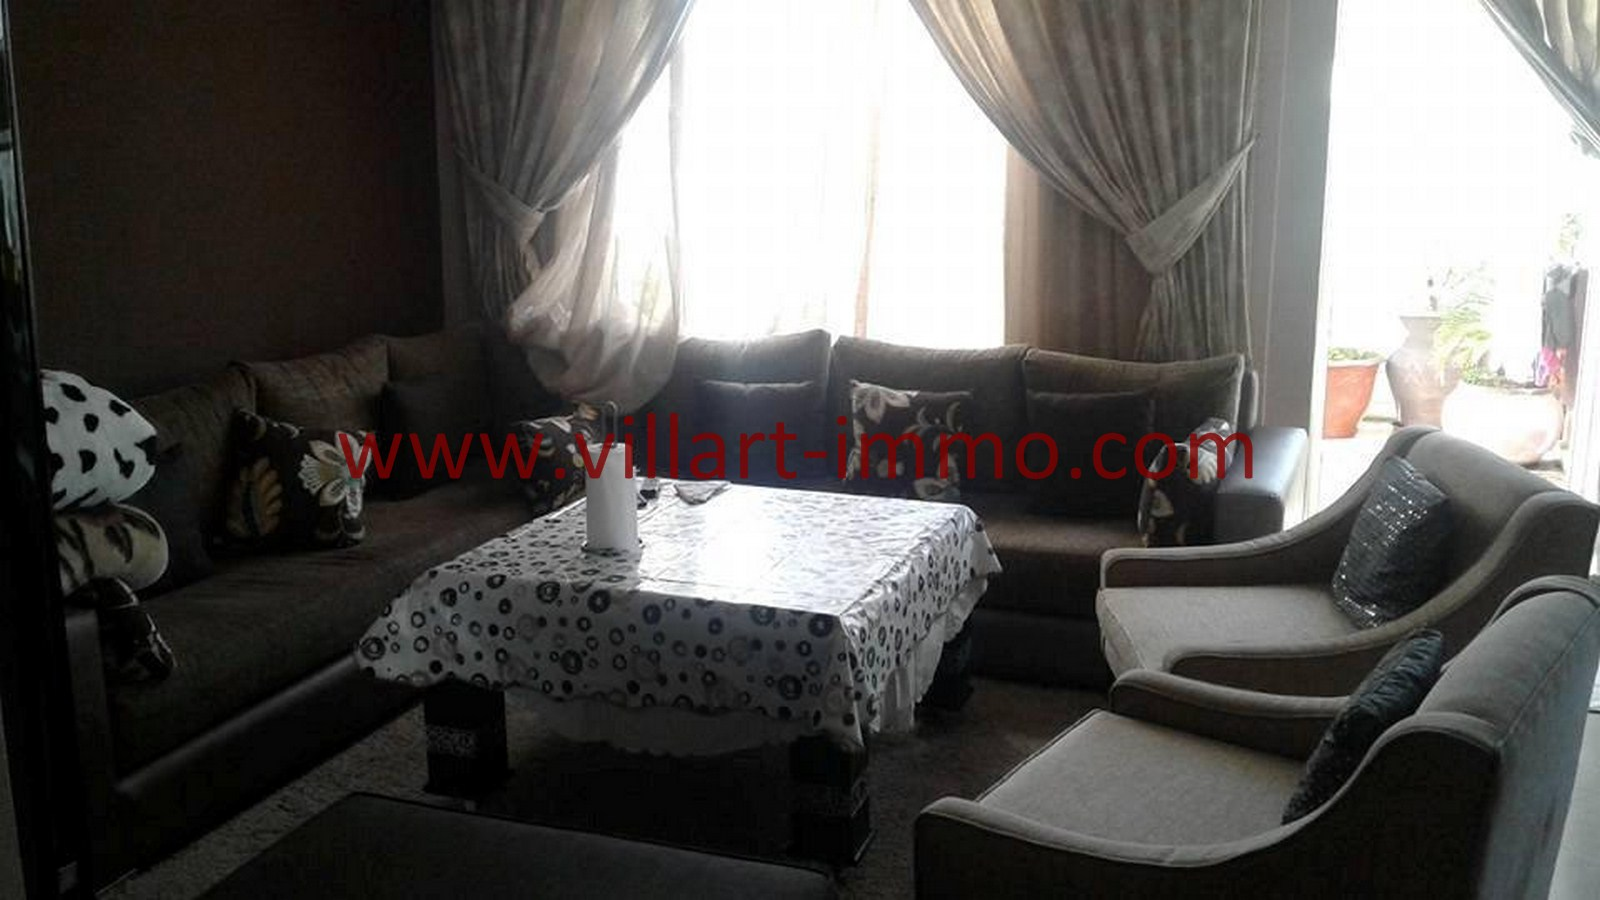 2-Vente-Appartement-Tanger-Route-de-Rabat-Salon 2-VA476-Villart Immo